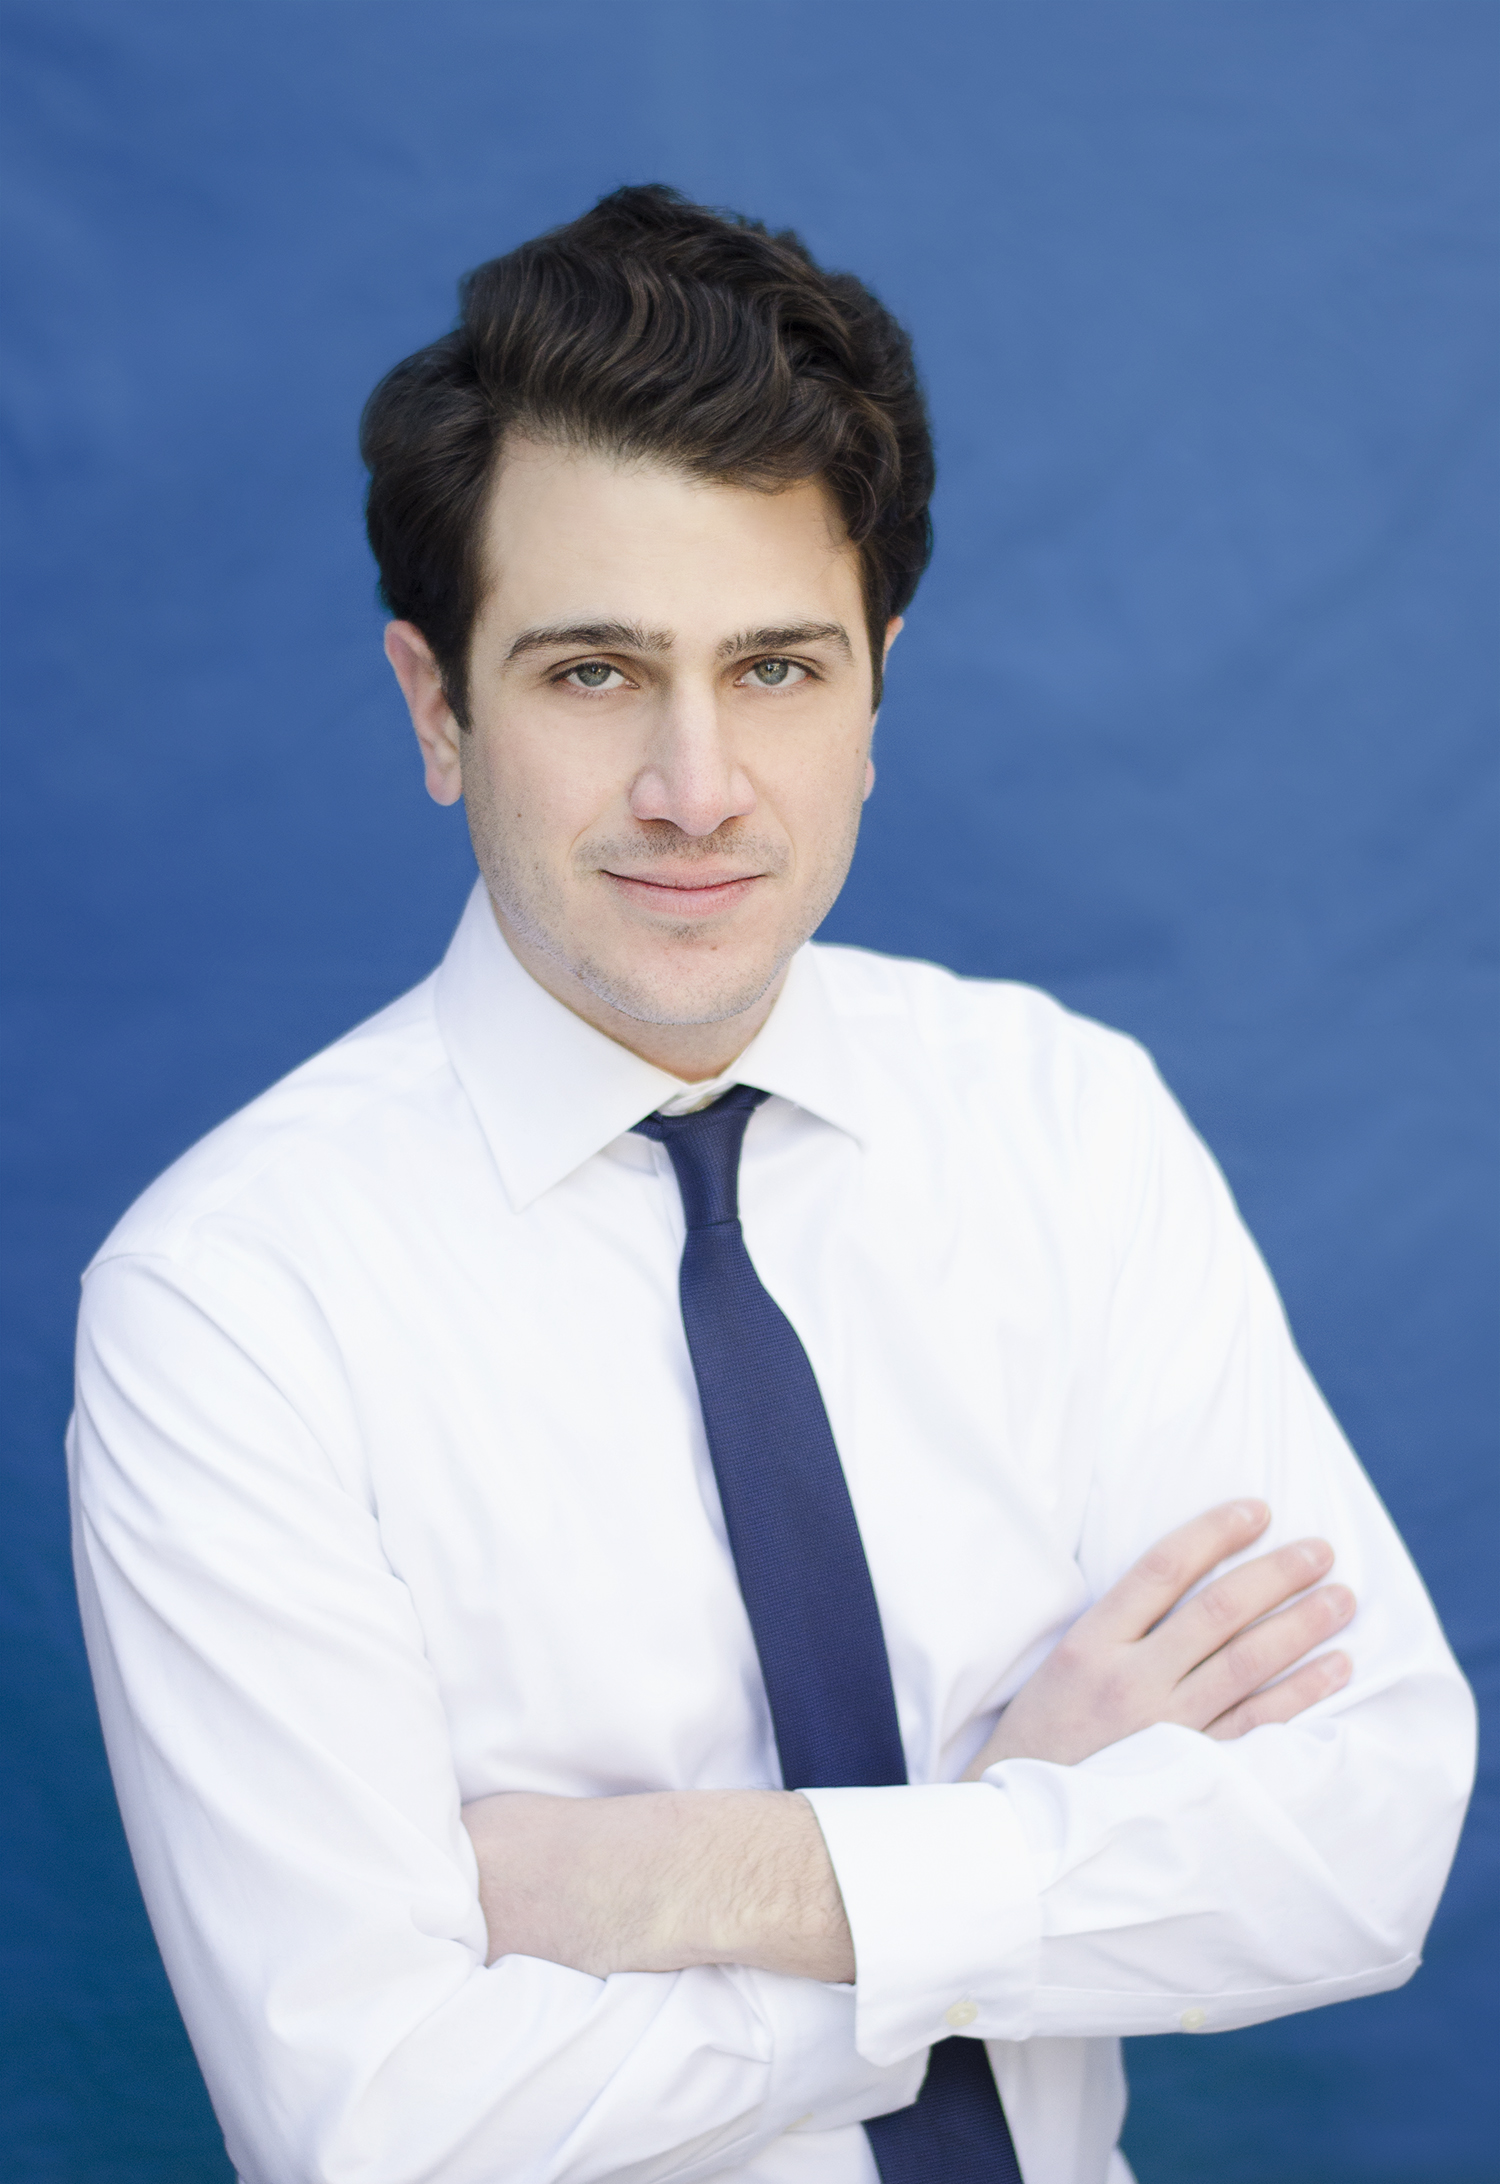 Greg Tomaselli  Accountant ProForma Kent State University, BA (2008)